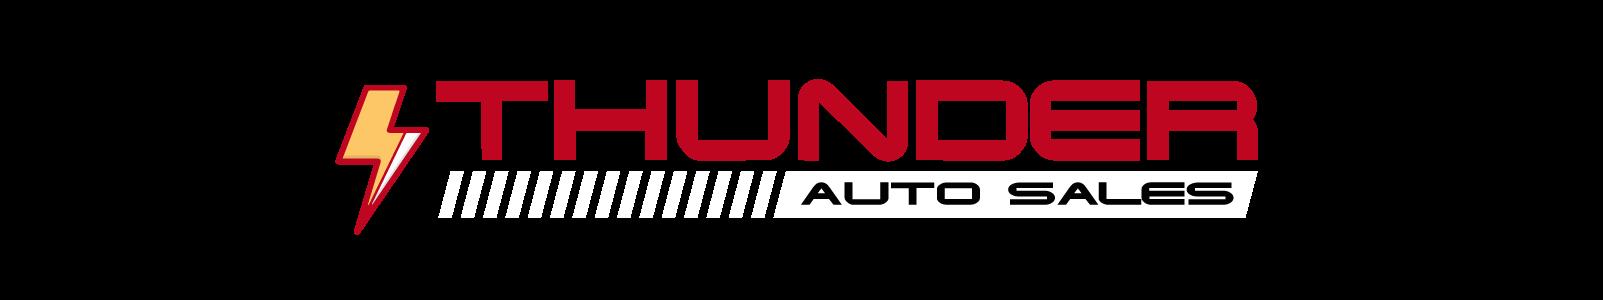 Thunder Auto Sales